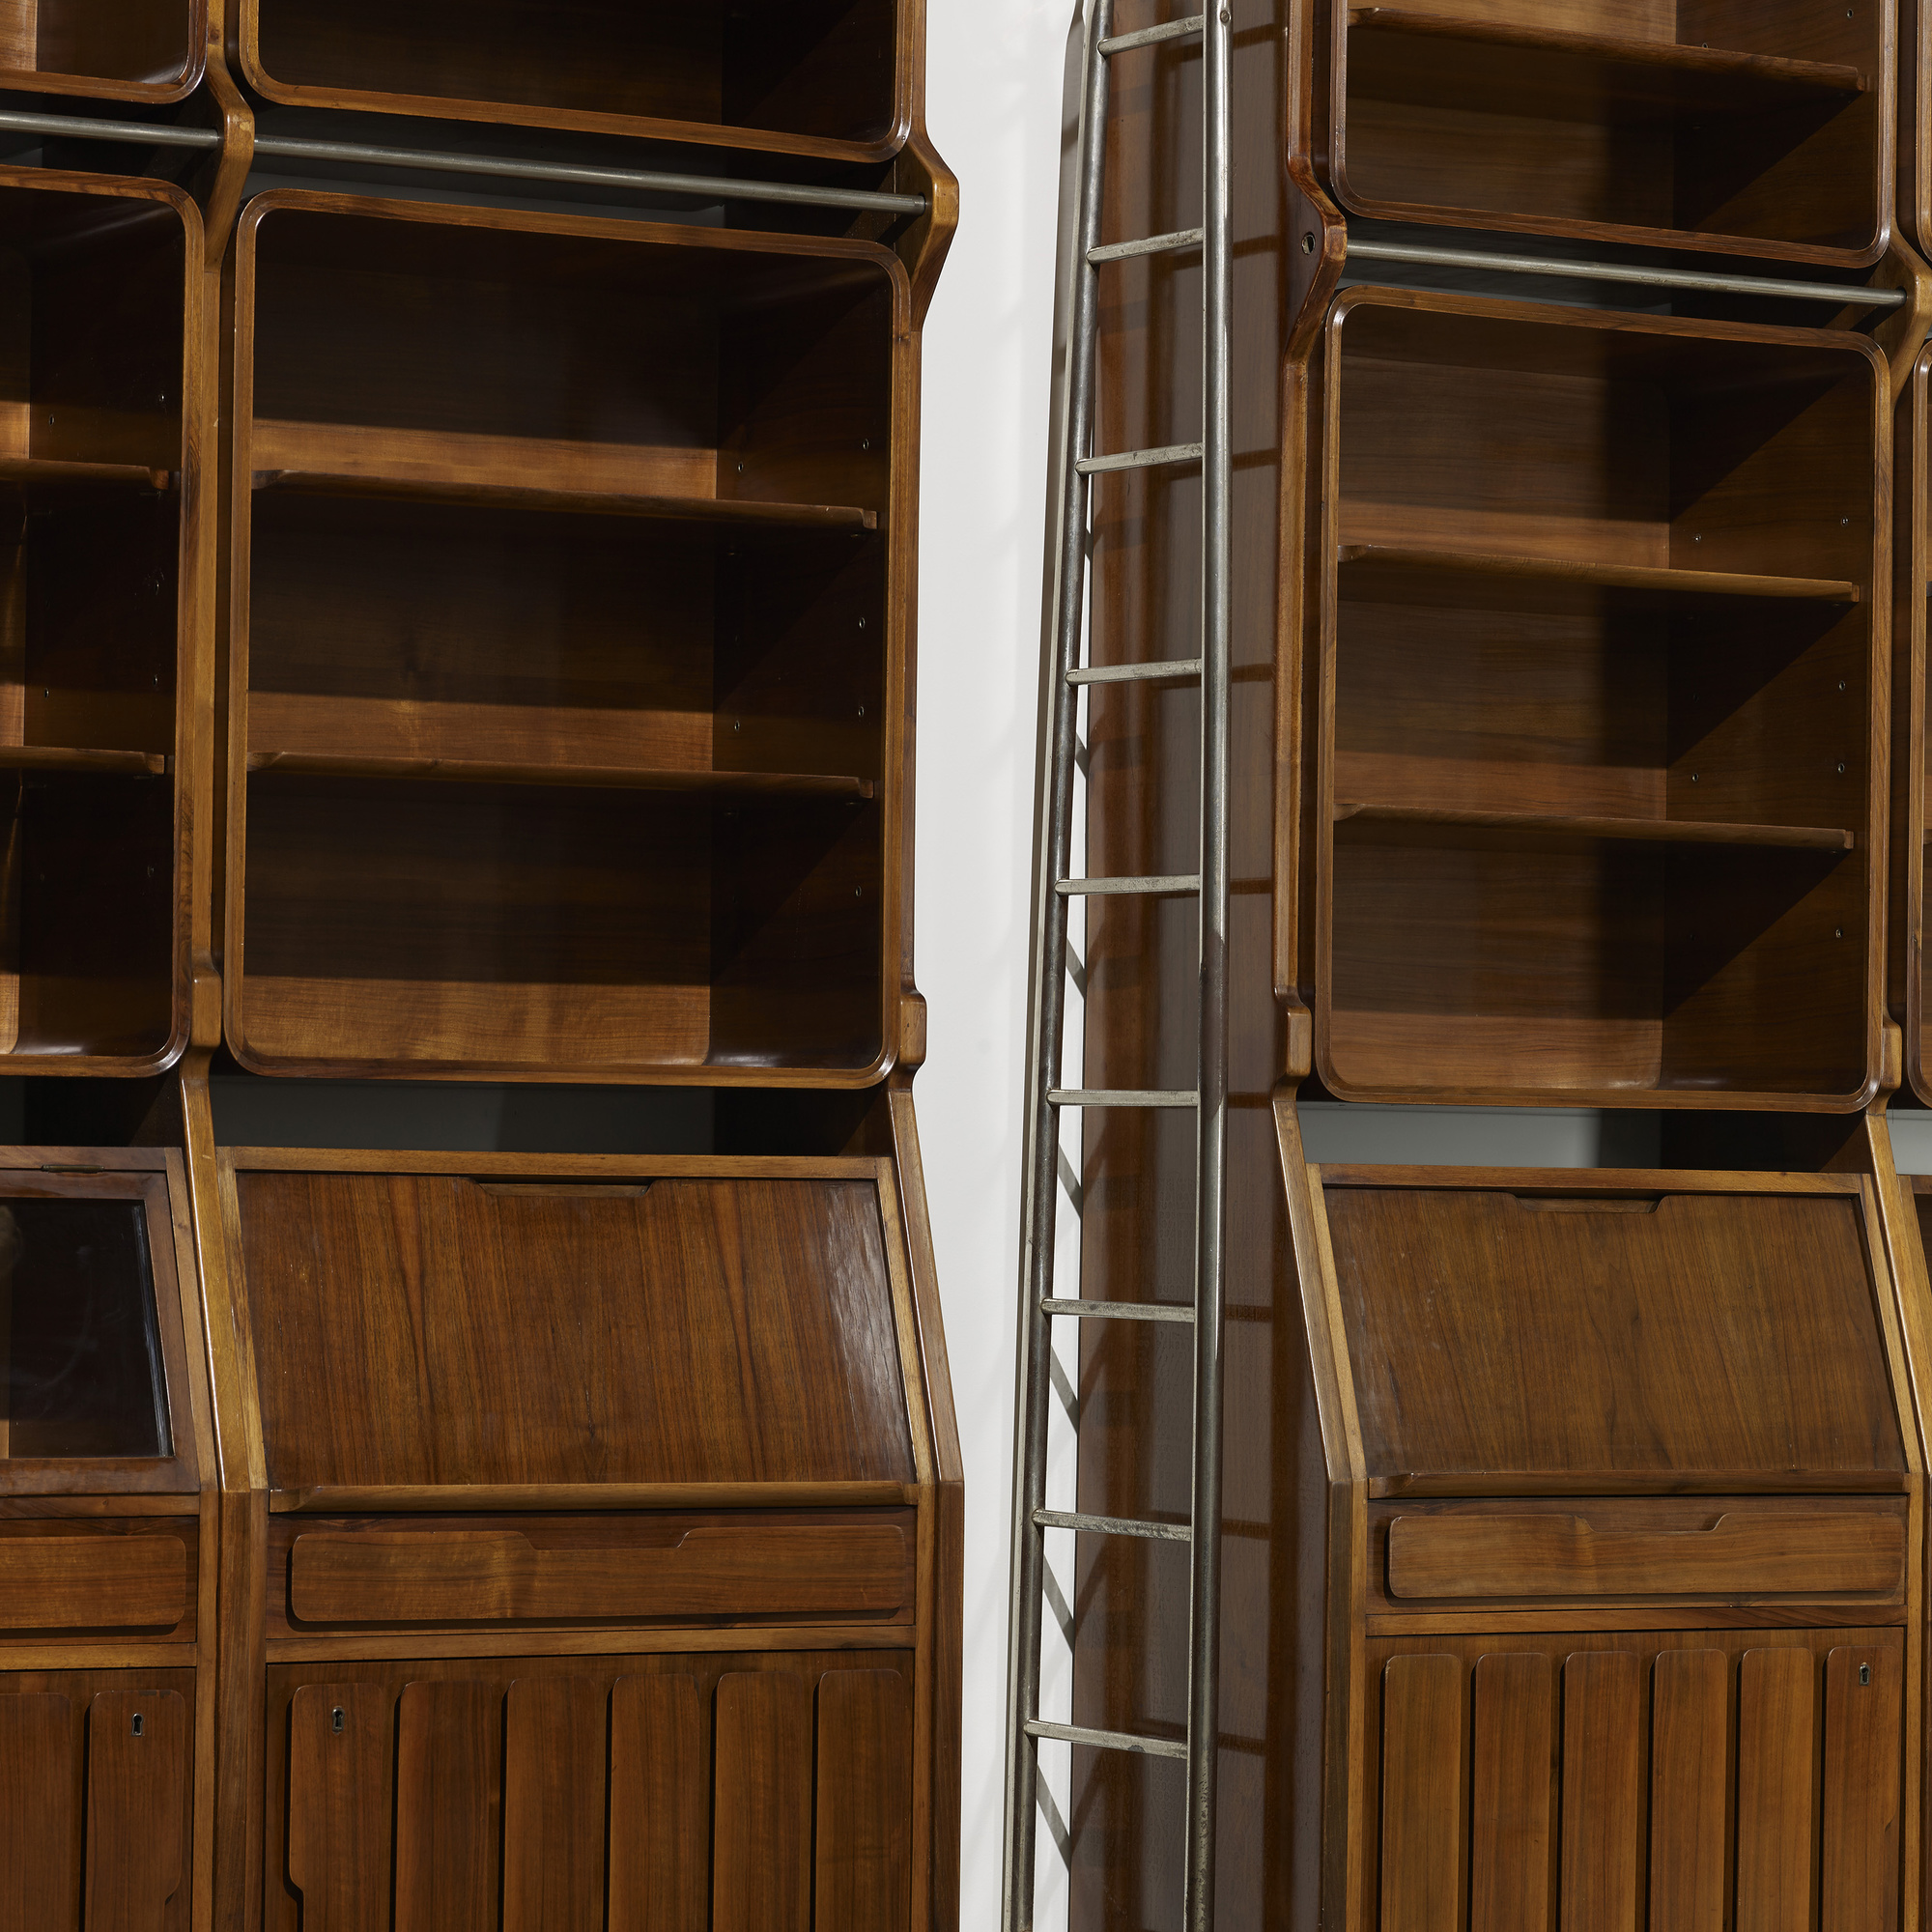 ideas built virginia bookcase richmond and bookshelves in pin custom bookcases bookshelf